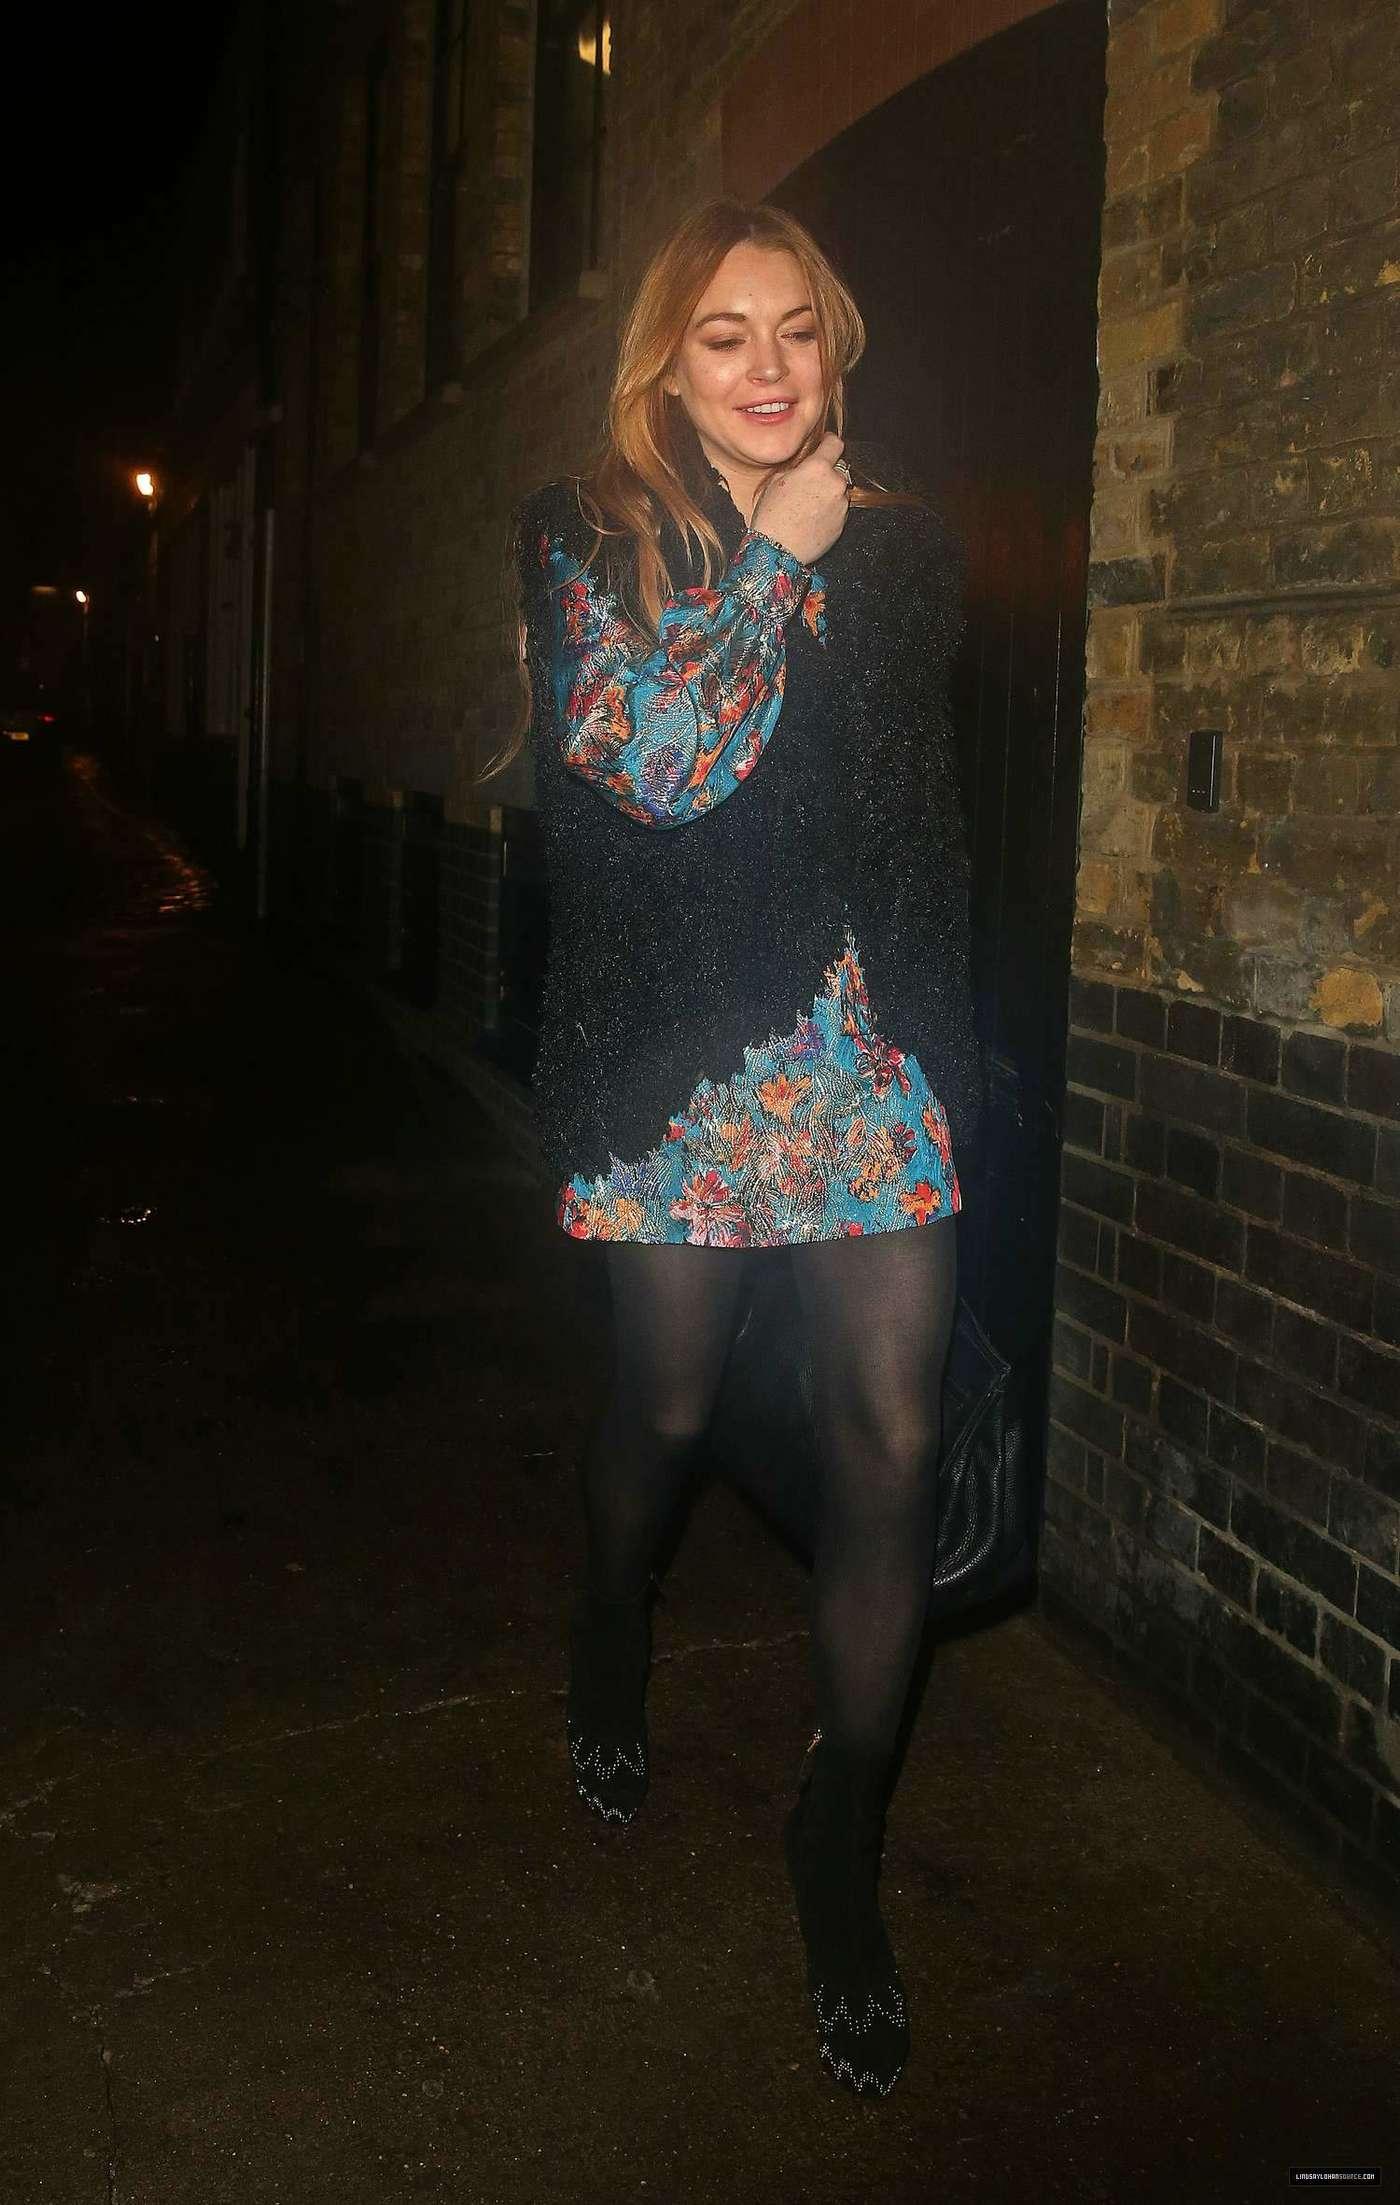 Lindsay Lohan 2014 : Lindsay Lohan in Mini Dress Leaves the Chiltern Firehouse -06